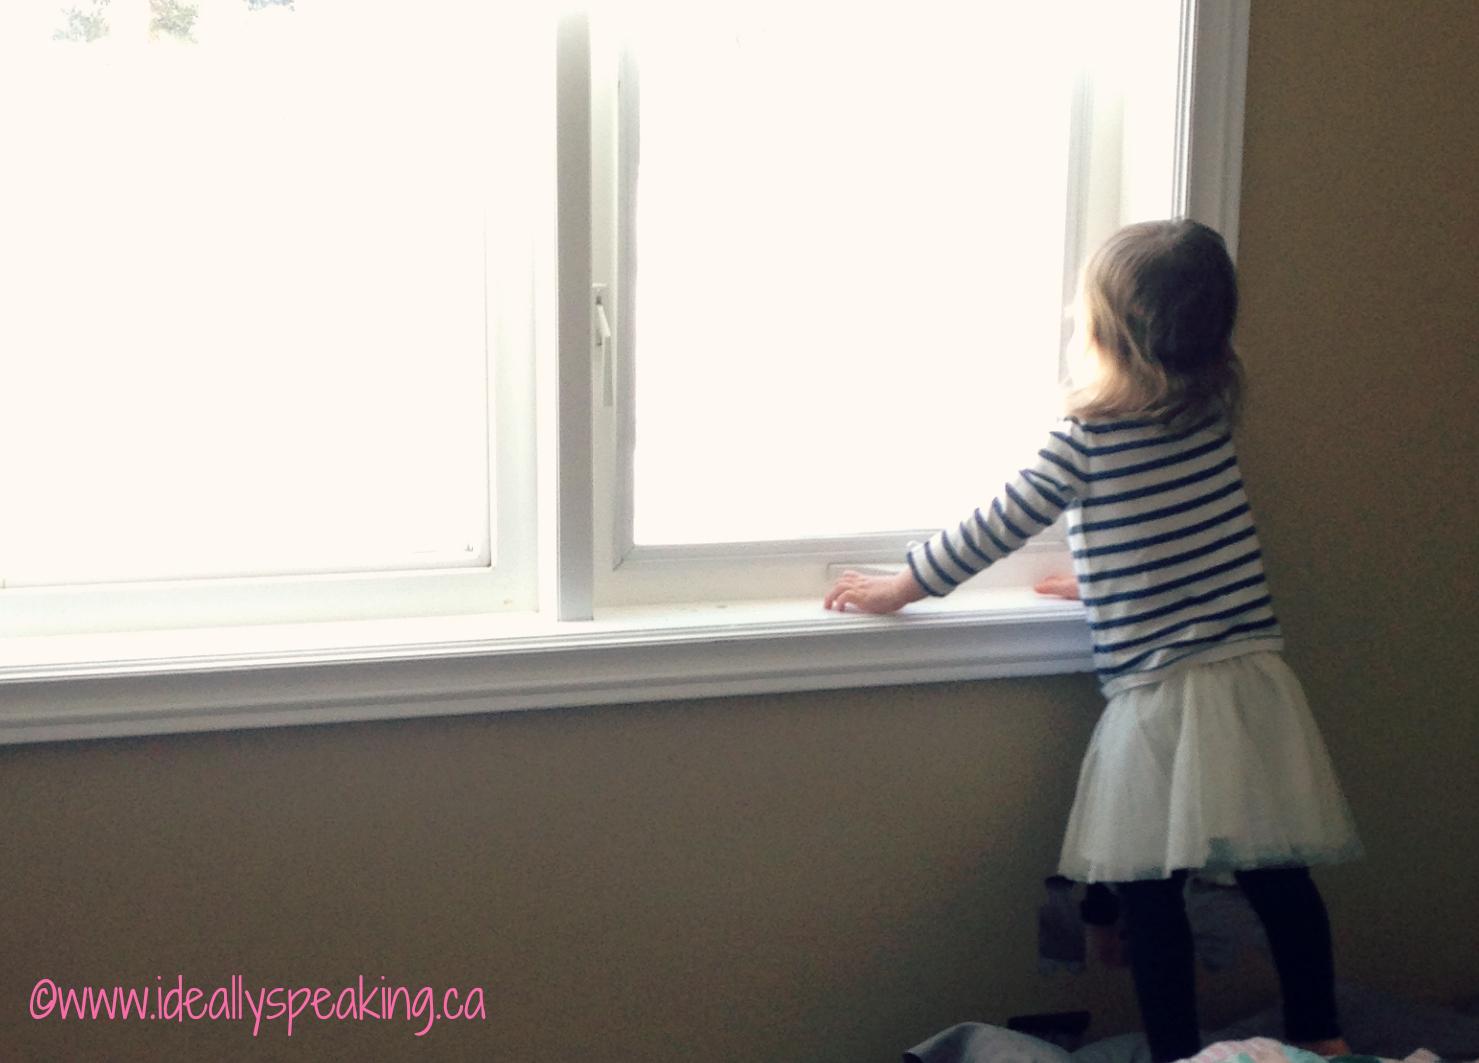 cute, toddler, parenting, family, mom blog, mom blog canada, iphonetography